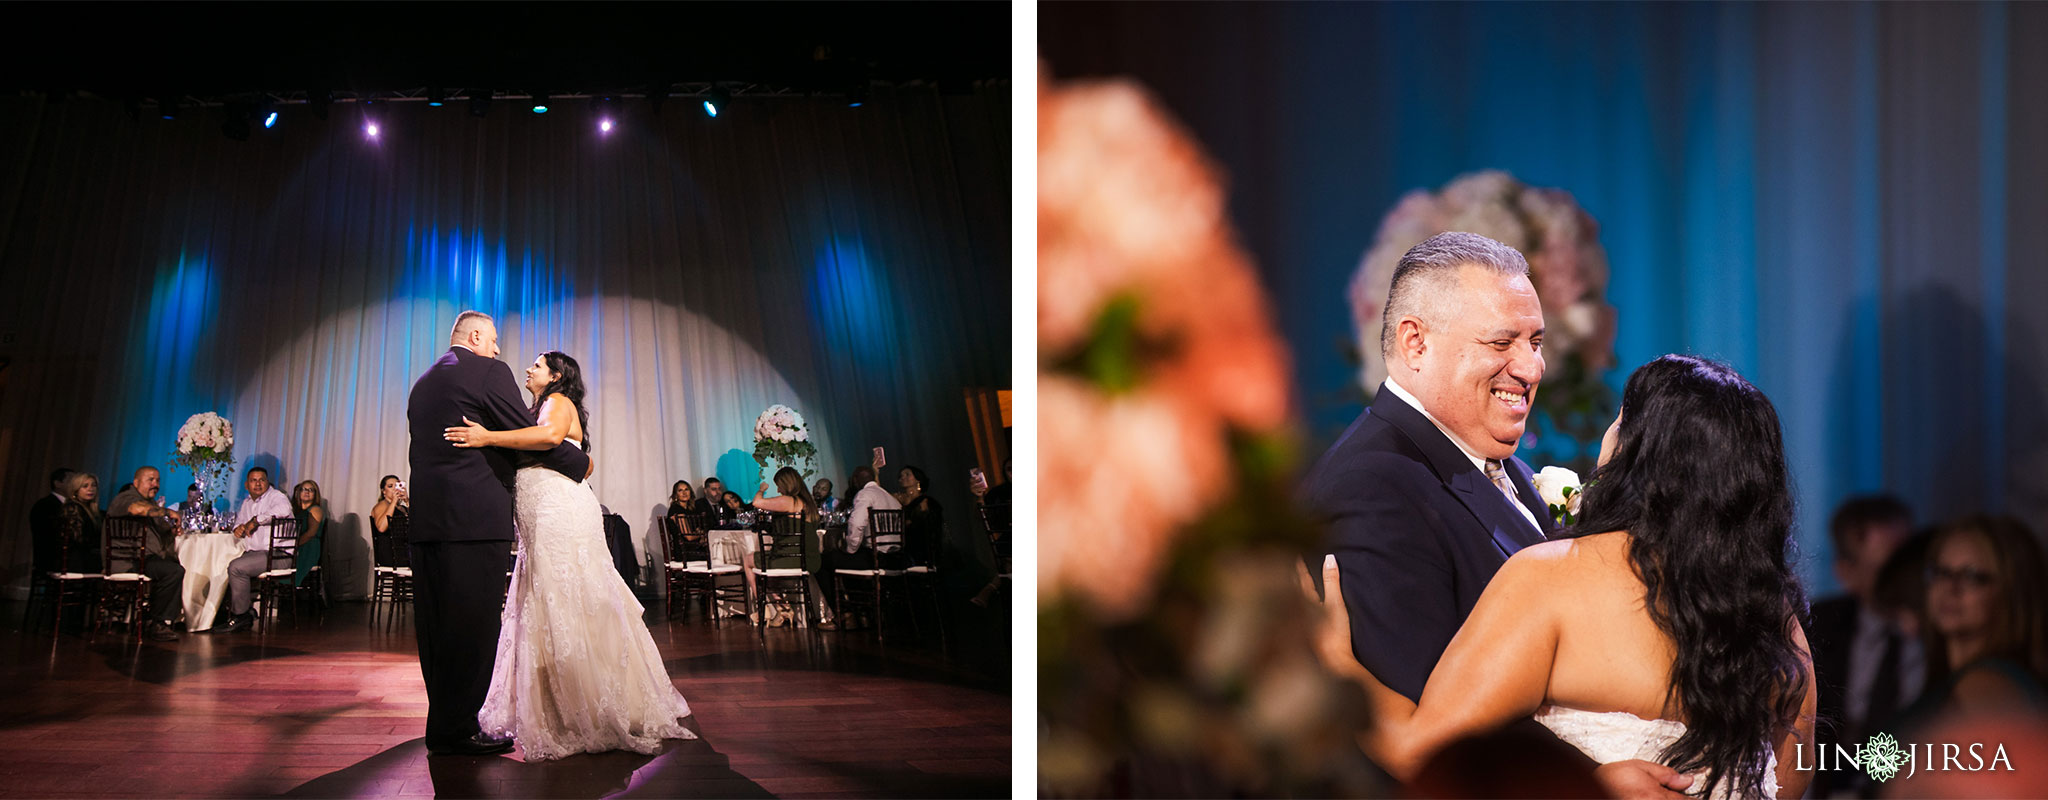 029 padua hills claremont wedding reception photography